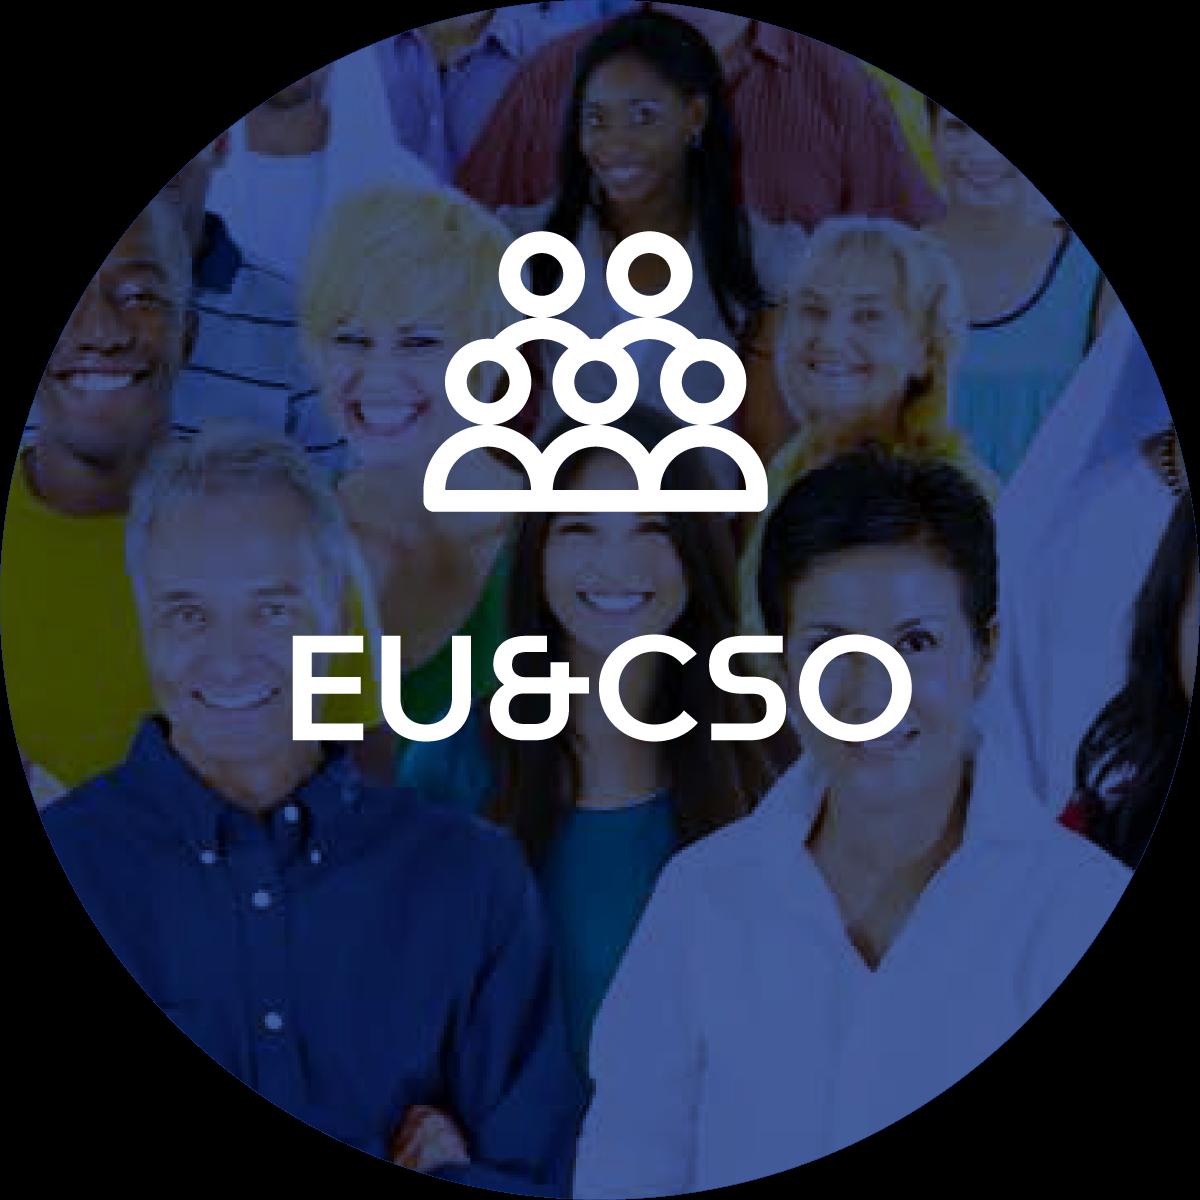 EU&CSO